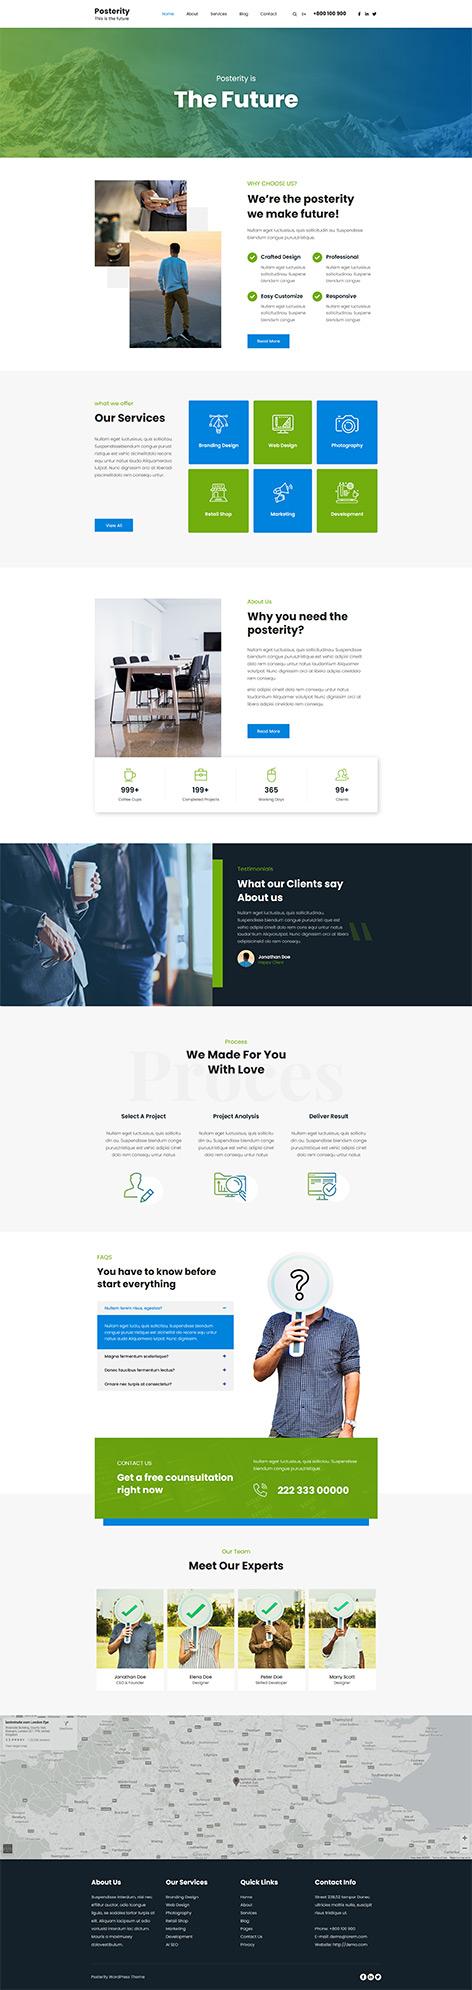 free creative agency WordPress theme